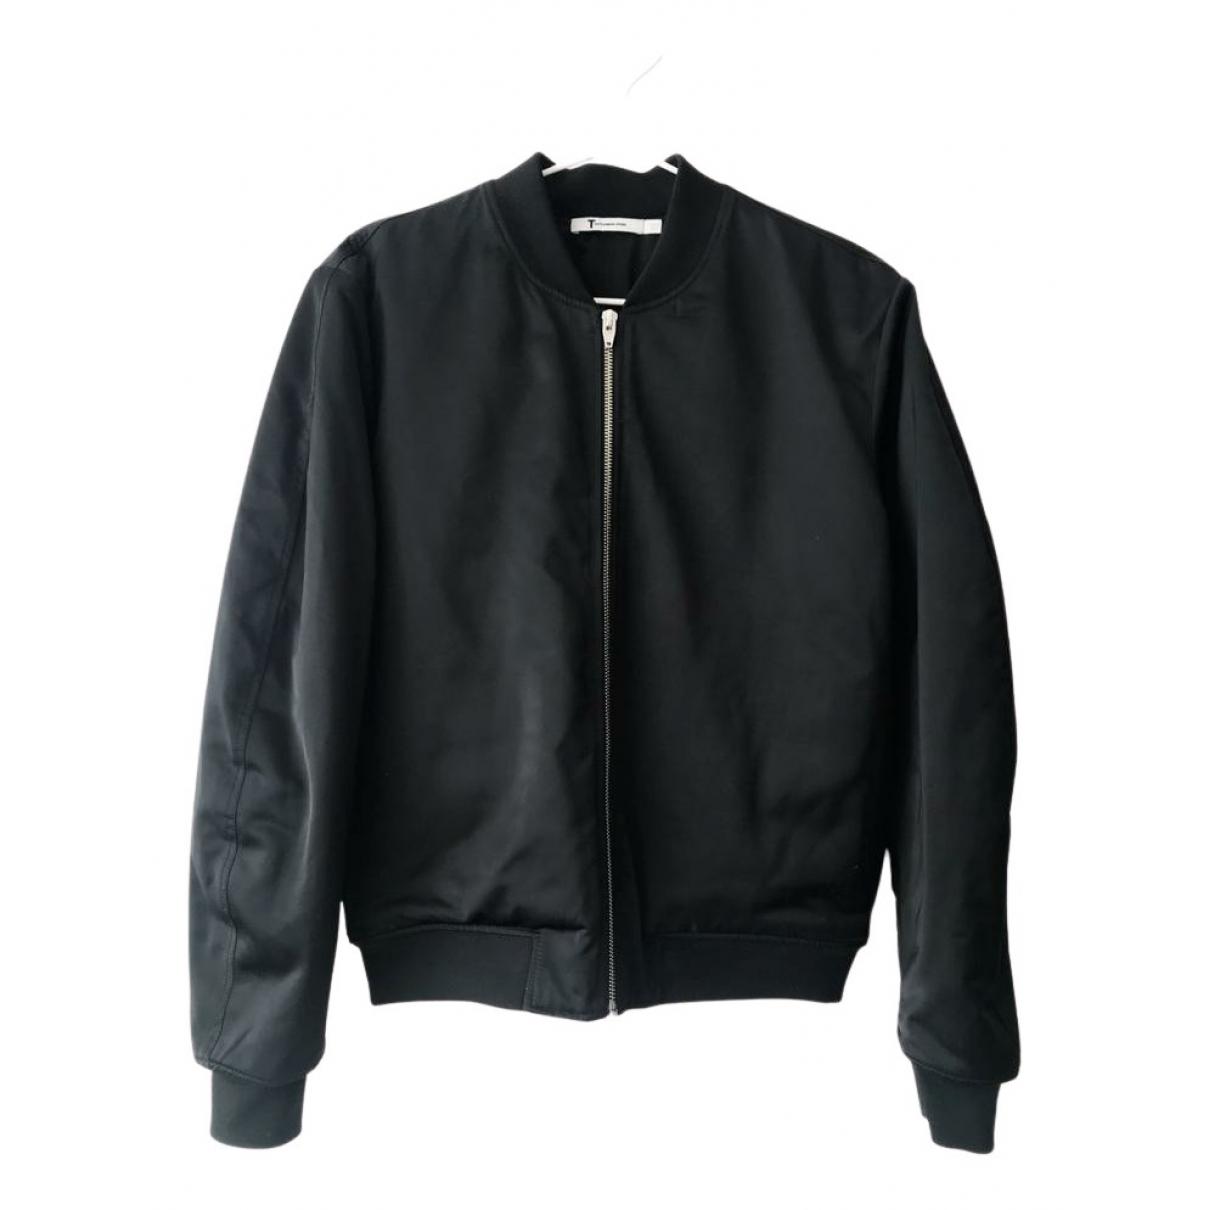 T By Alexander Wang N Black jacket for Women M International